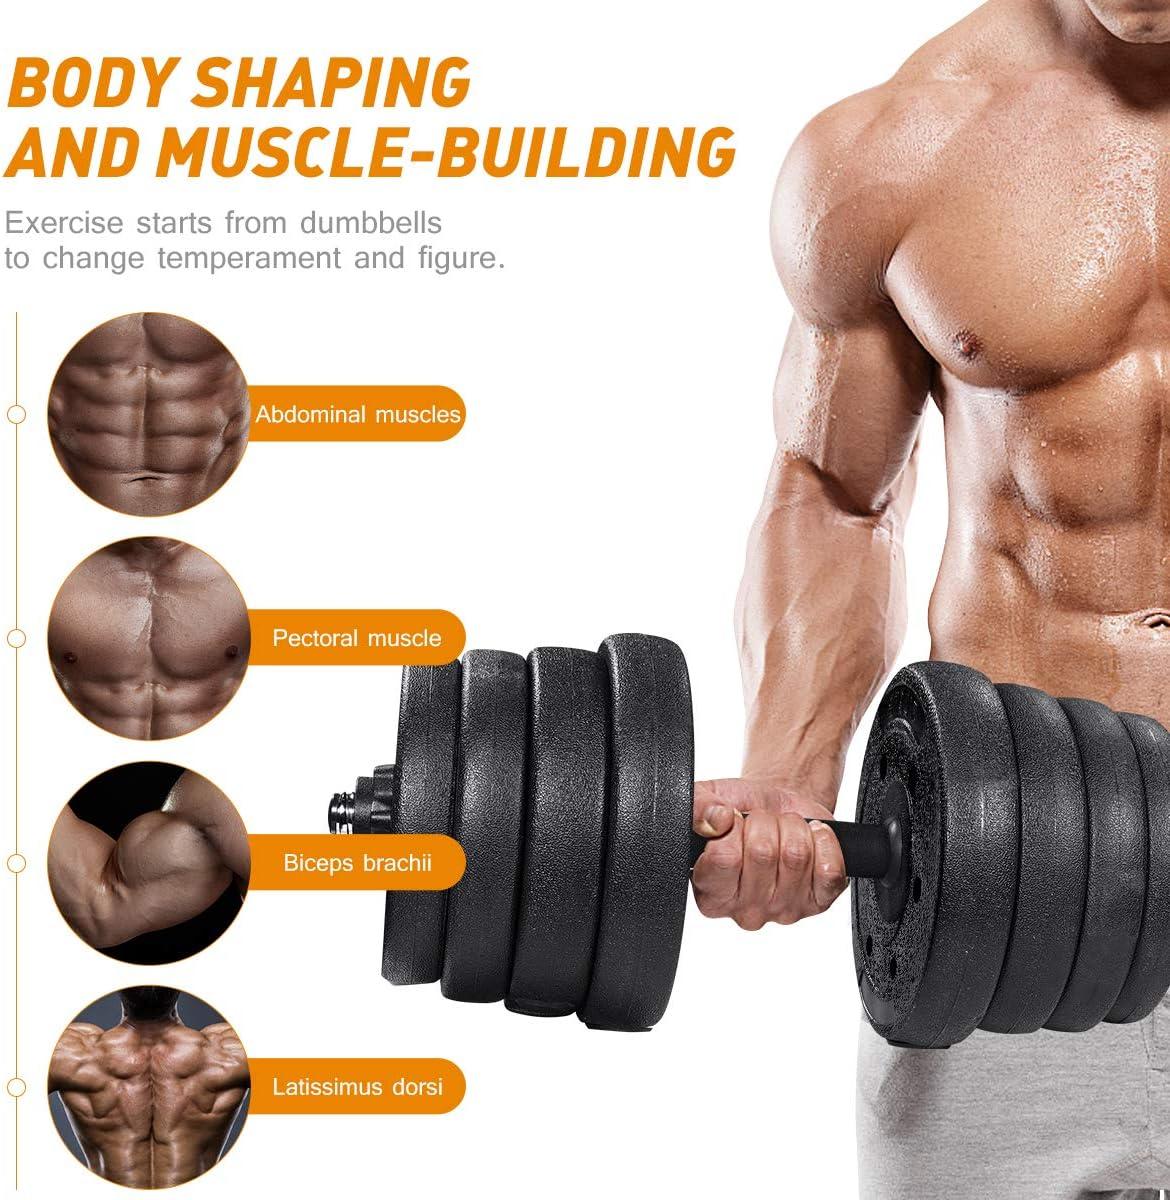 BESPORTBLE Dumbbells Set Durable Training Equipment 66LB Adjustable Weights Dumbbells Set for Bodybuilding Training